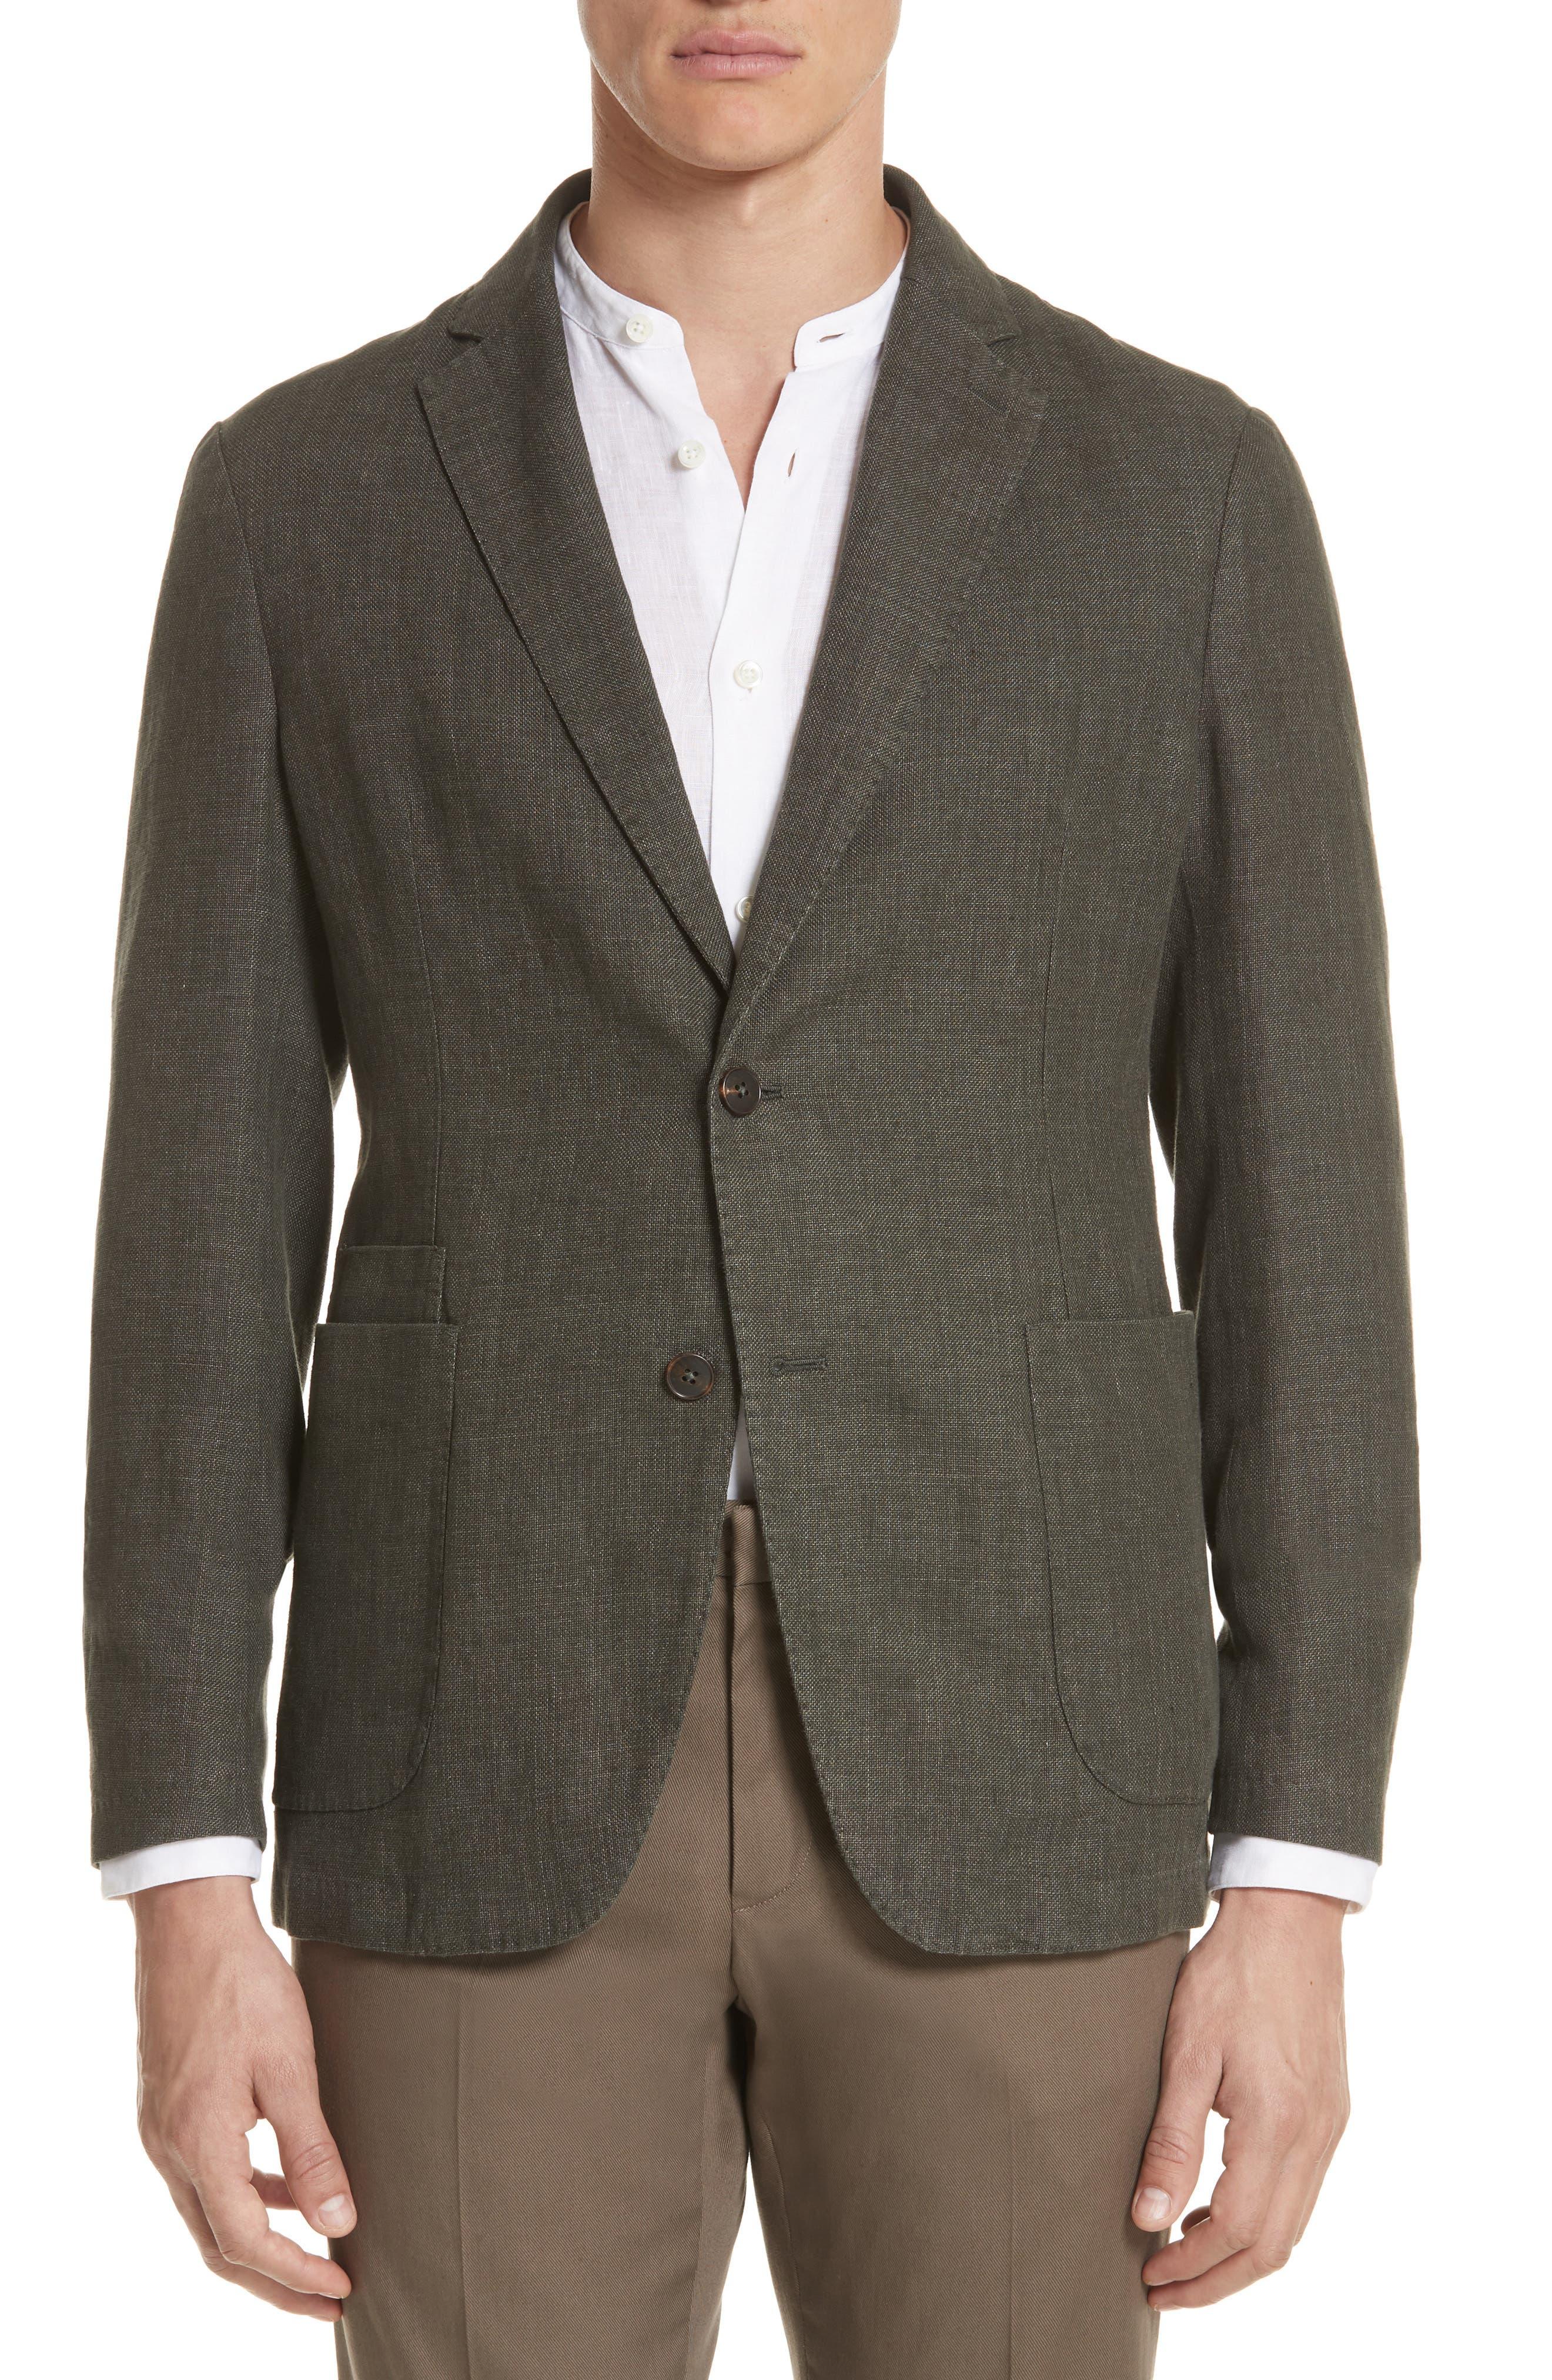 Z Zegna Trim Fit Linen & Cotton Blazer